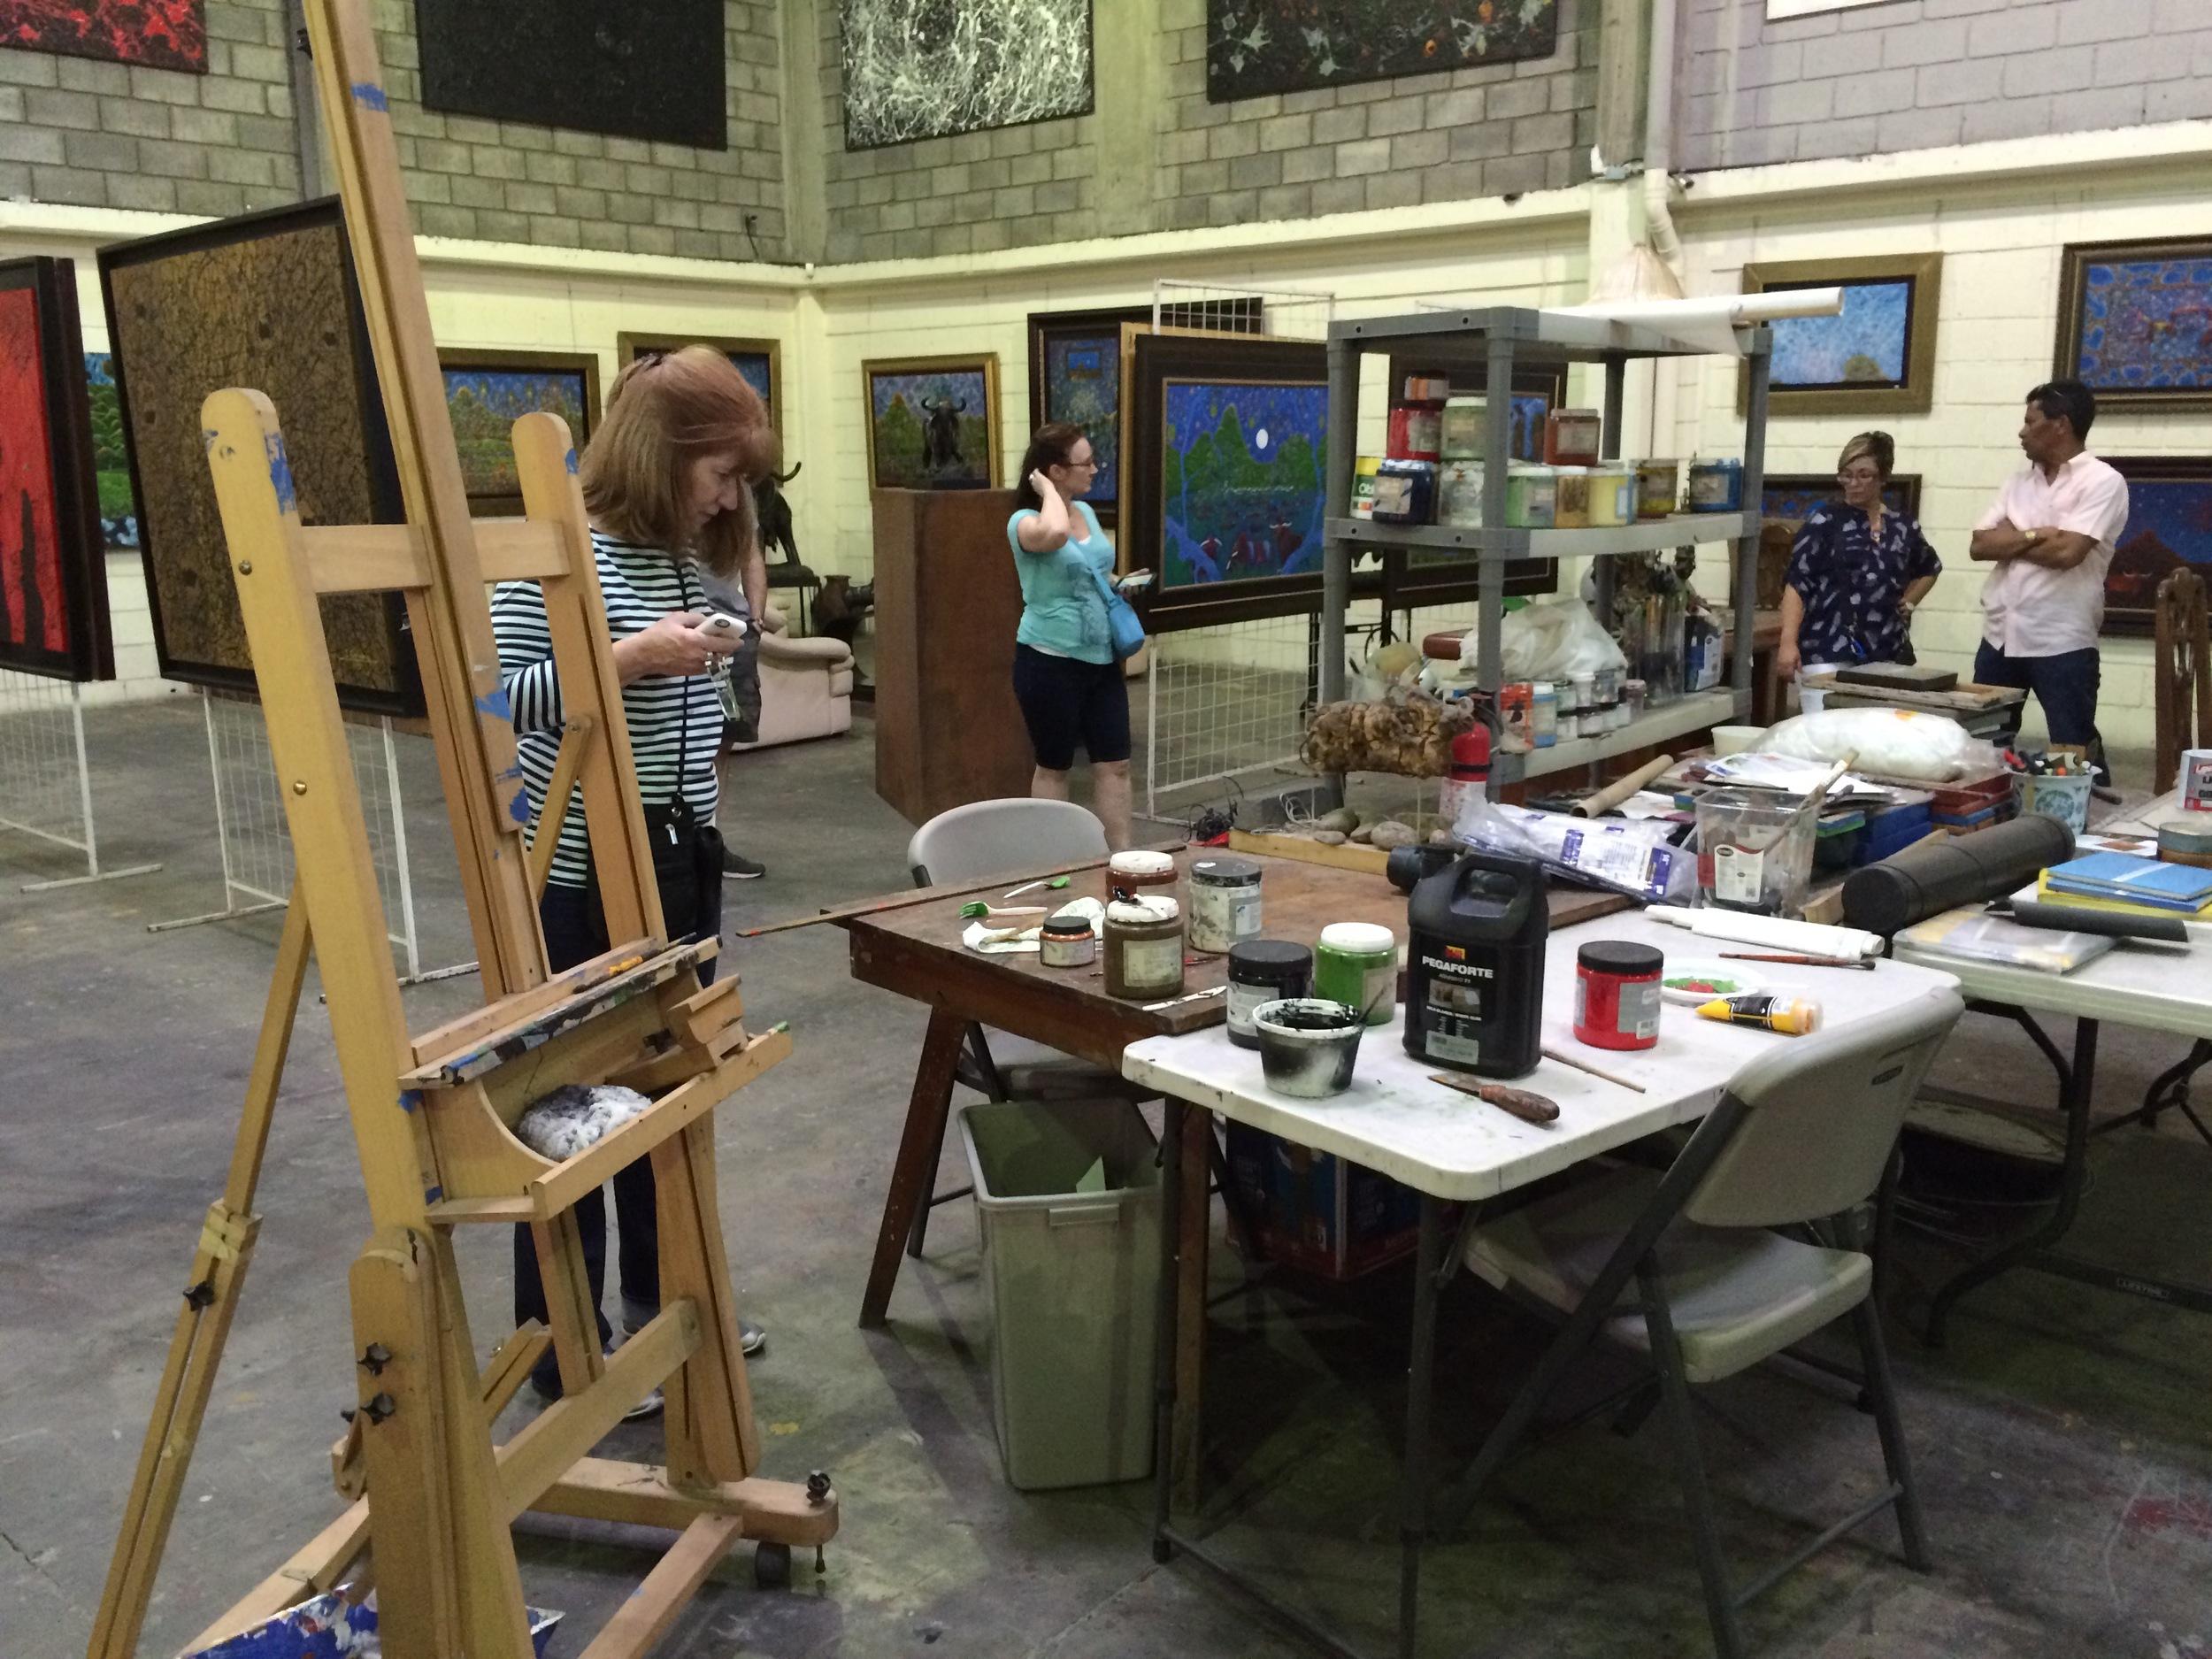 In Isidro con Wong's warehouse studio